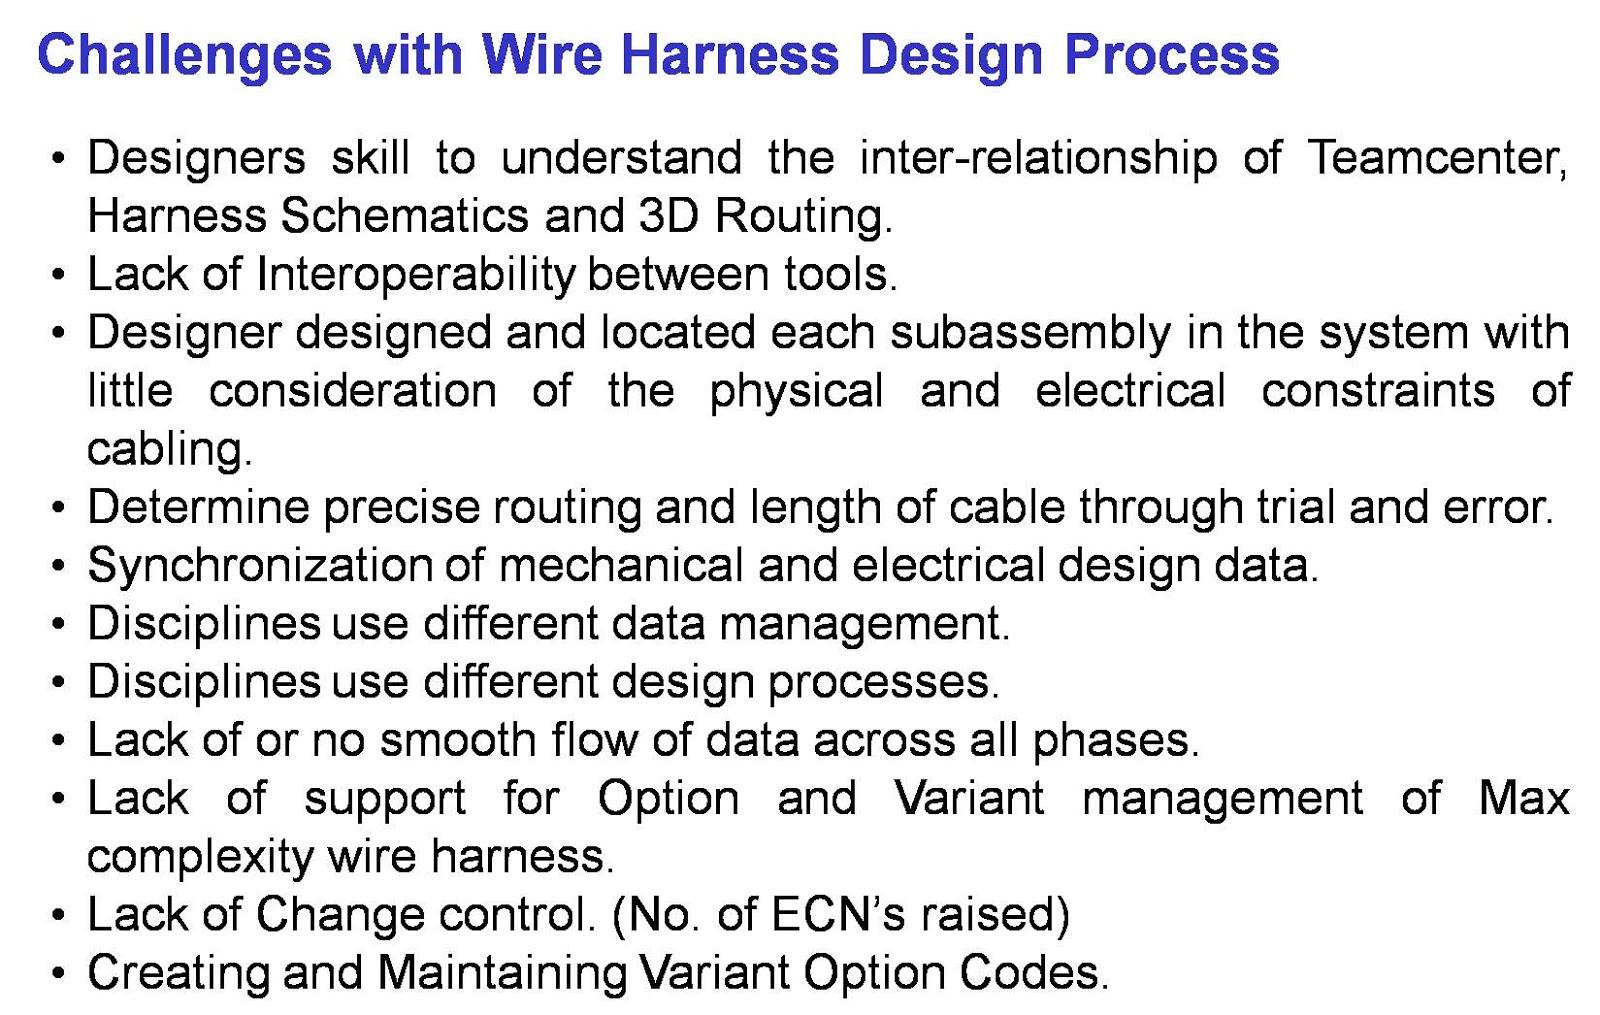 Bhupesh Sharma Wiring Harness Design In Plm Benchmarking